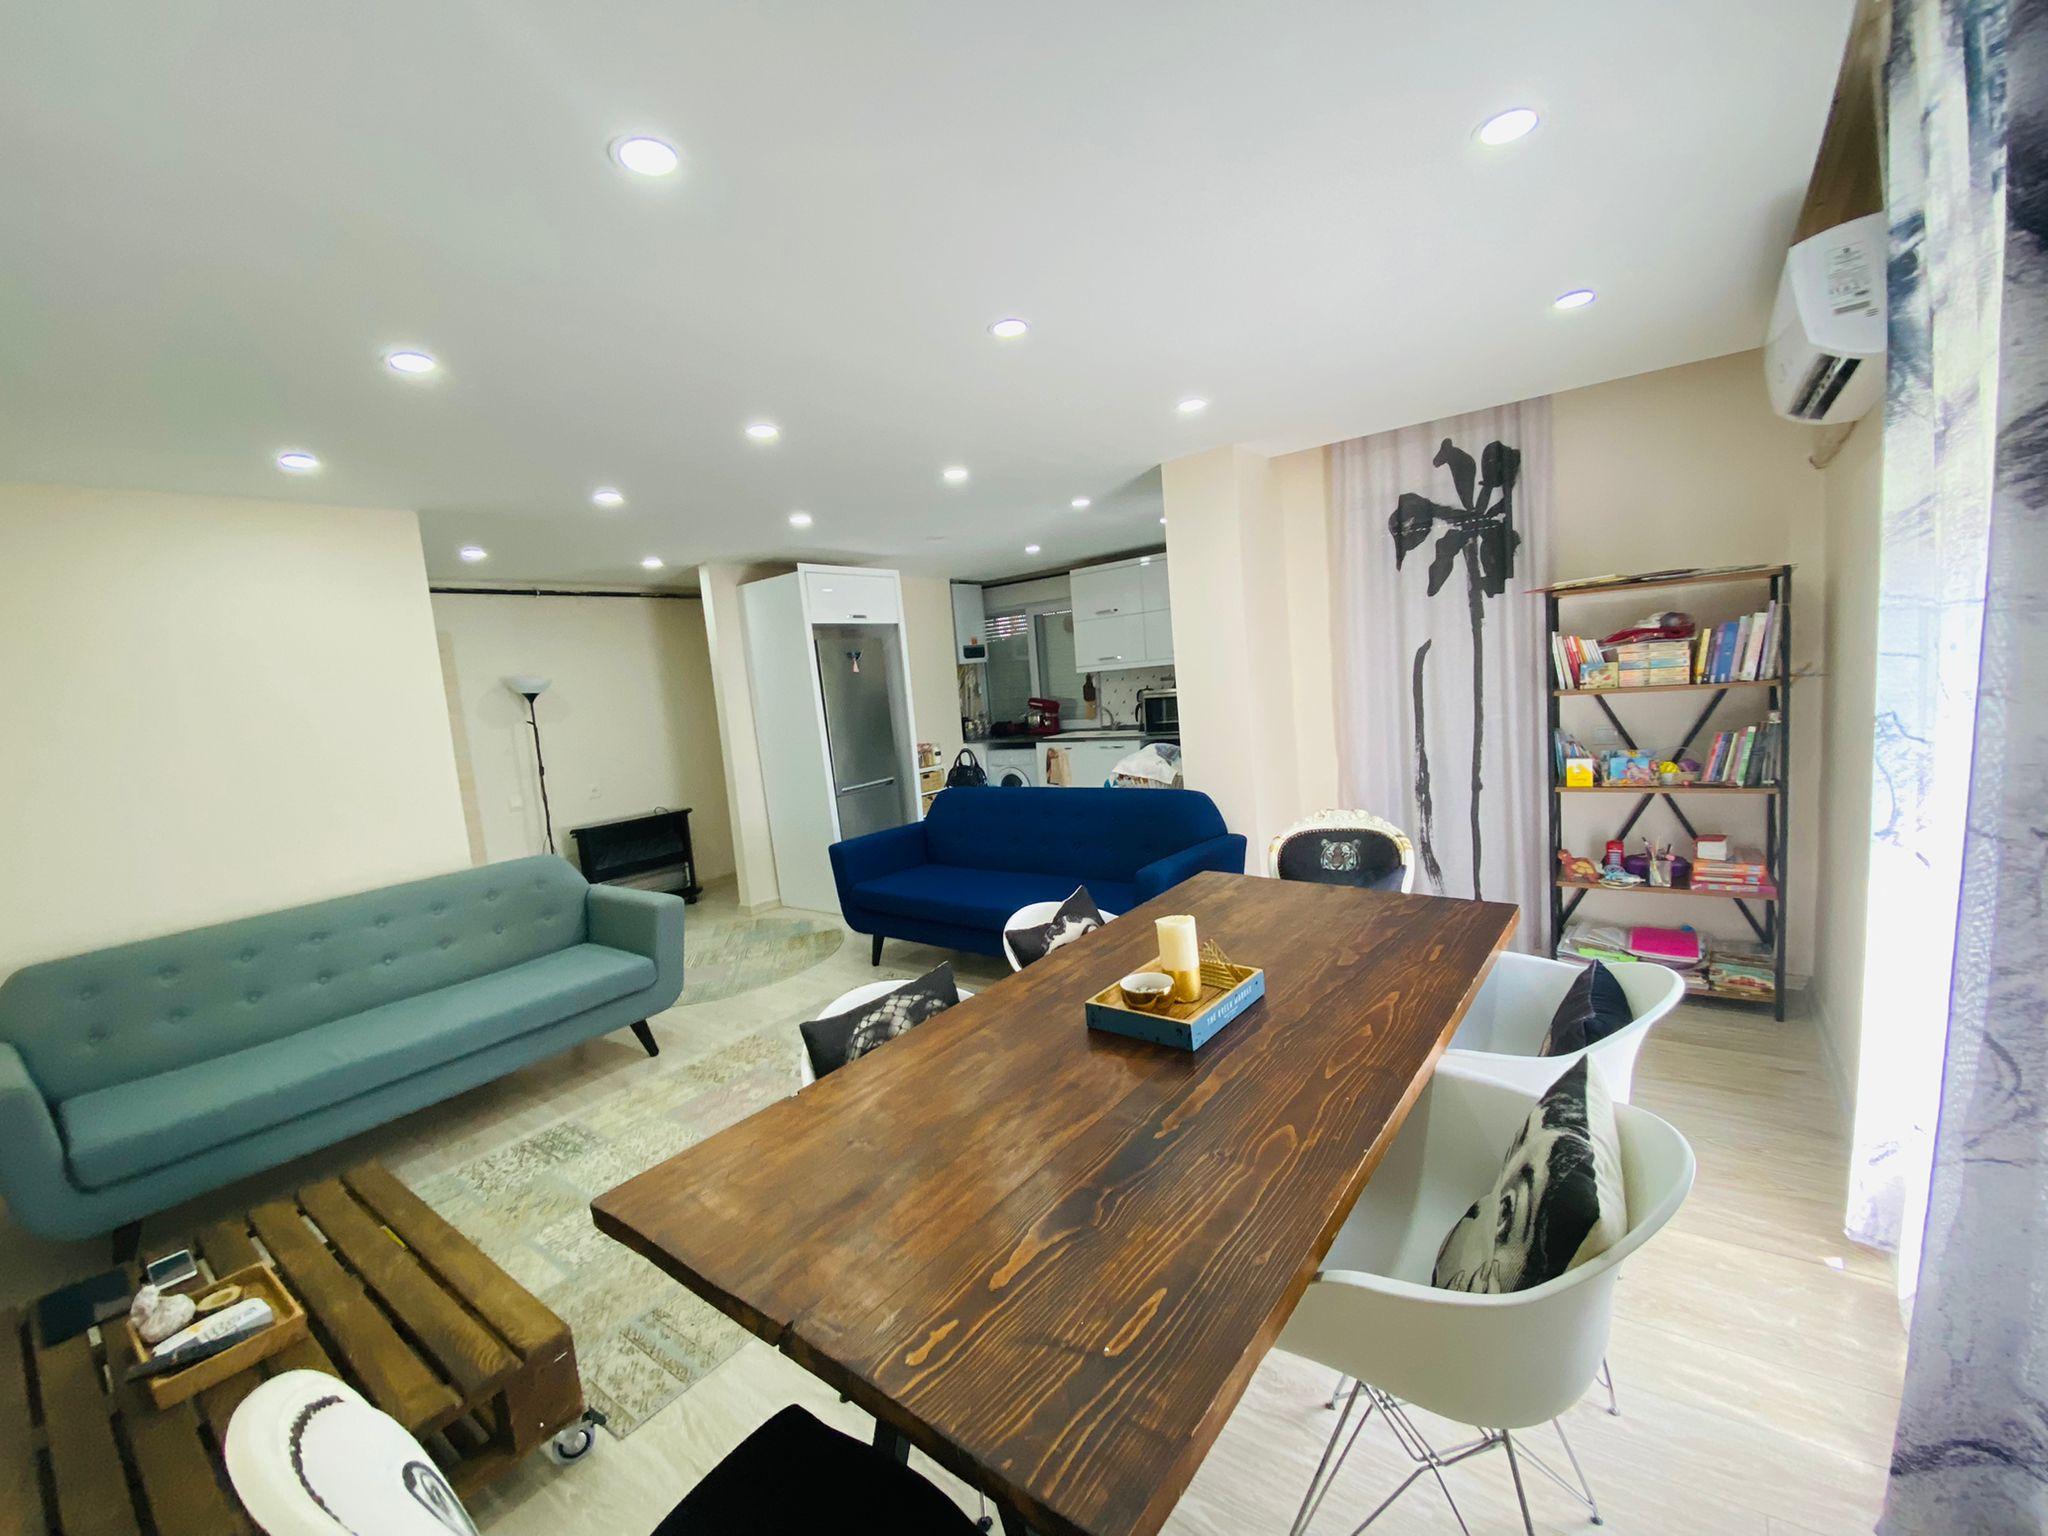 Трёхкомнатная квартира в микрорайоне Лиман - Фото 16